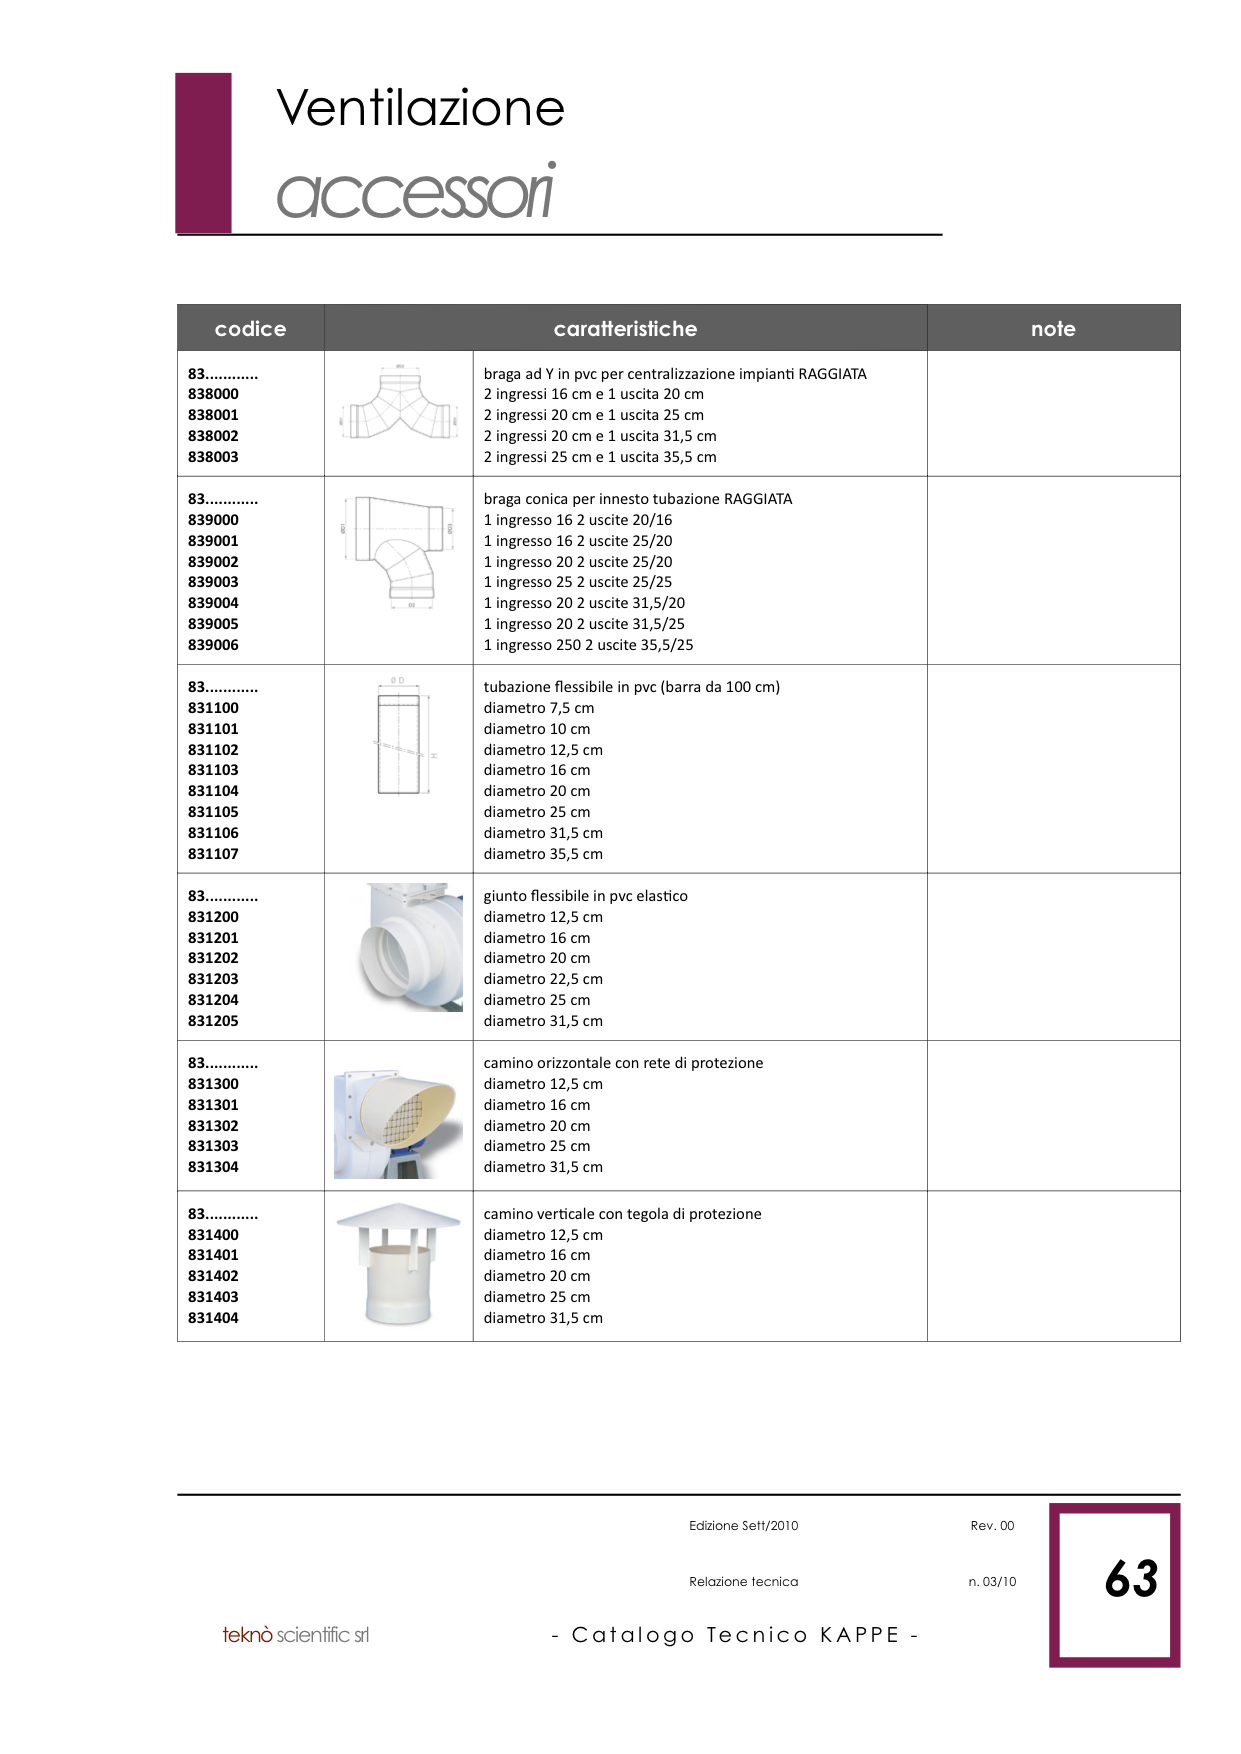 KAPPE Catalogo Tecnico Generale copia 3.png